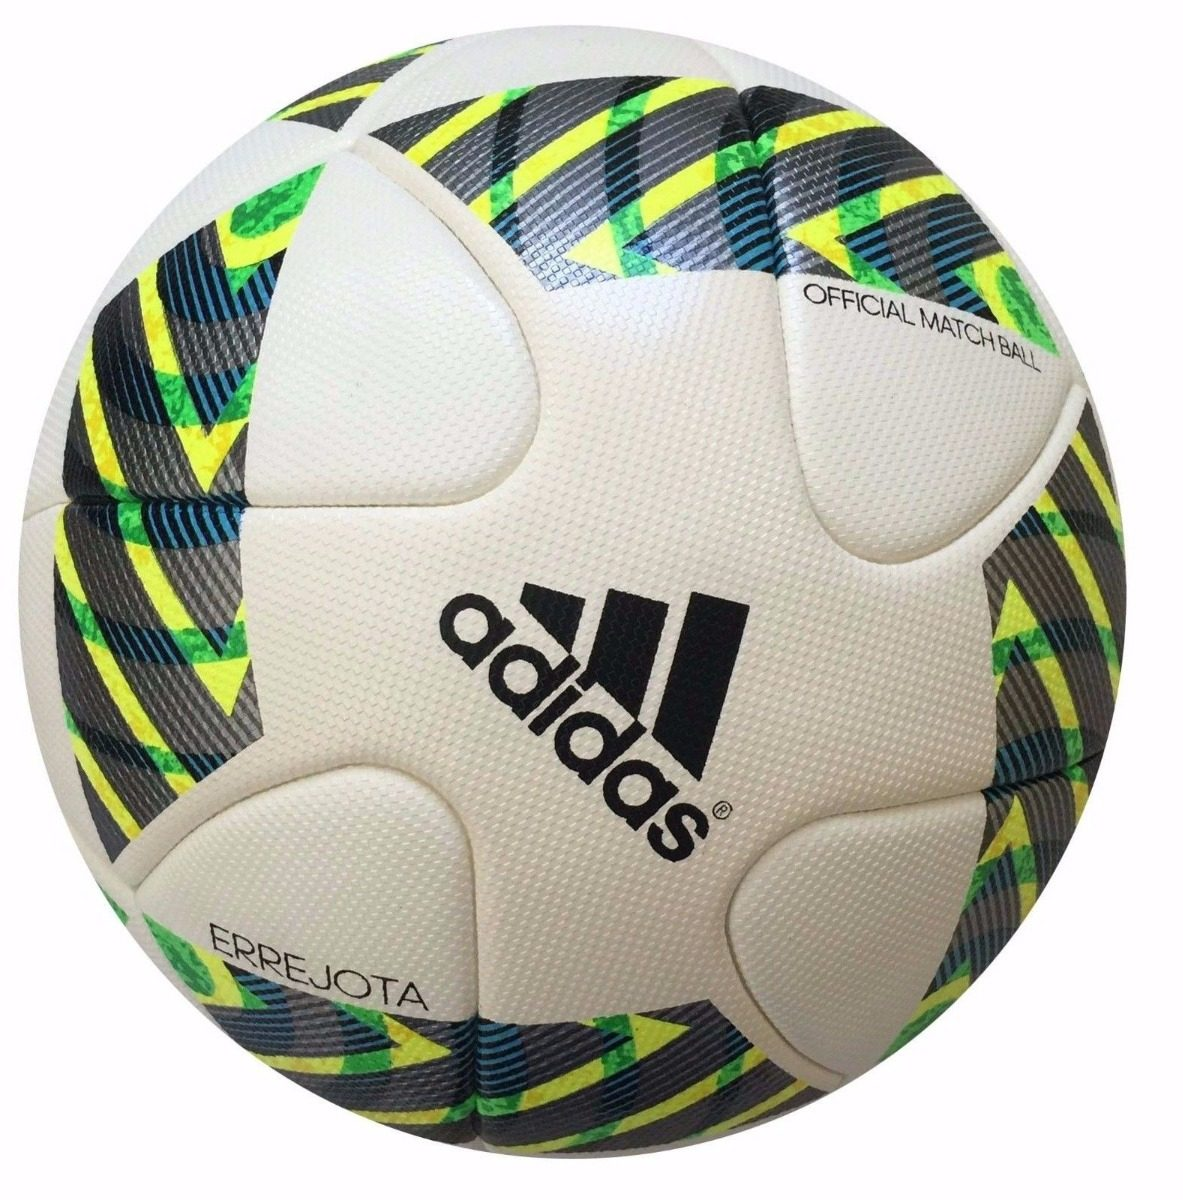 5b11f368d7 ... where can i buy 8a804 b357f bola campo adidas errejota oficial match  ball nova 1magnus. ...